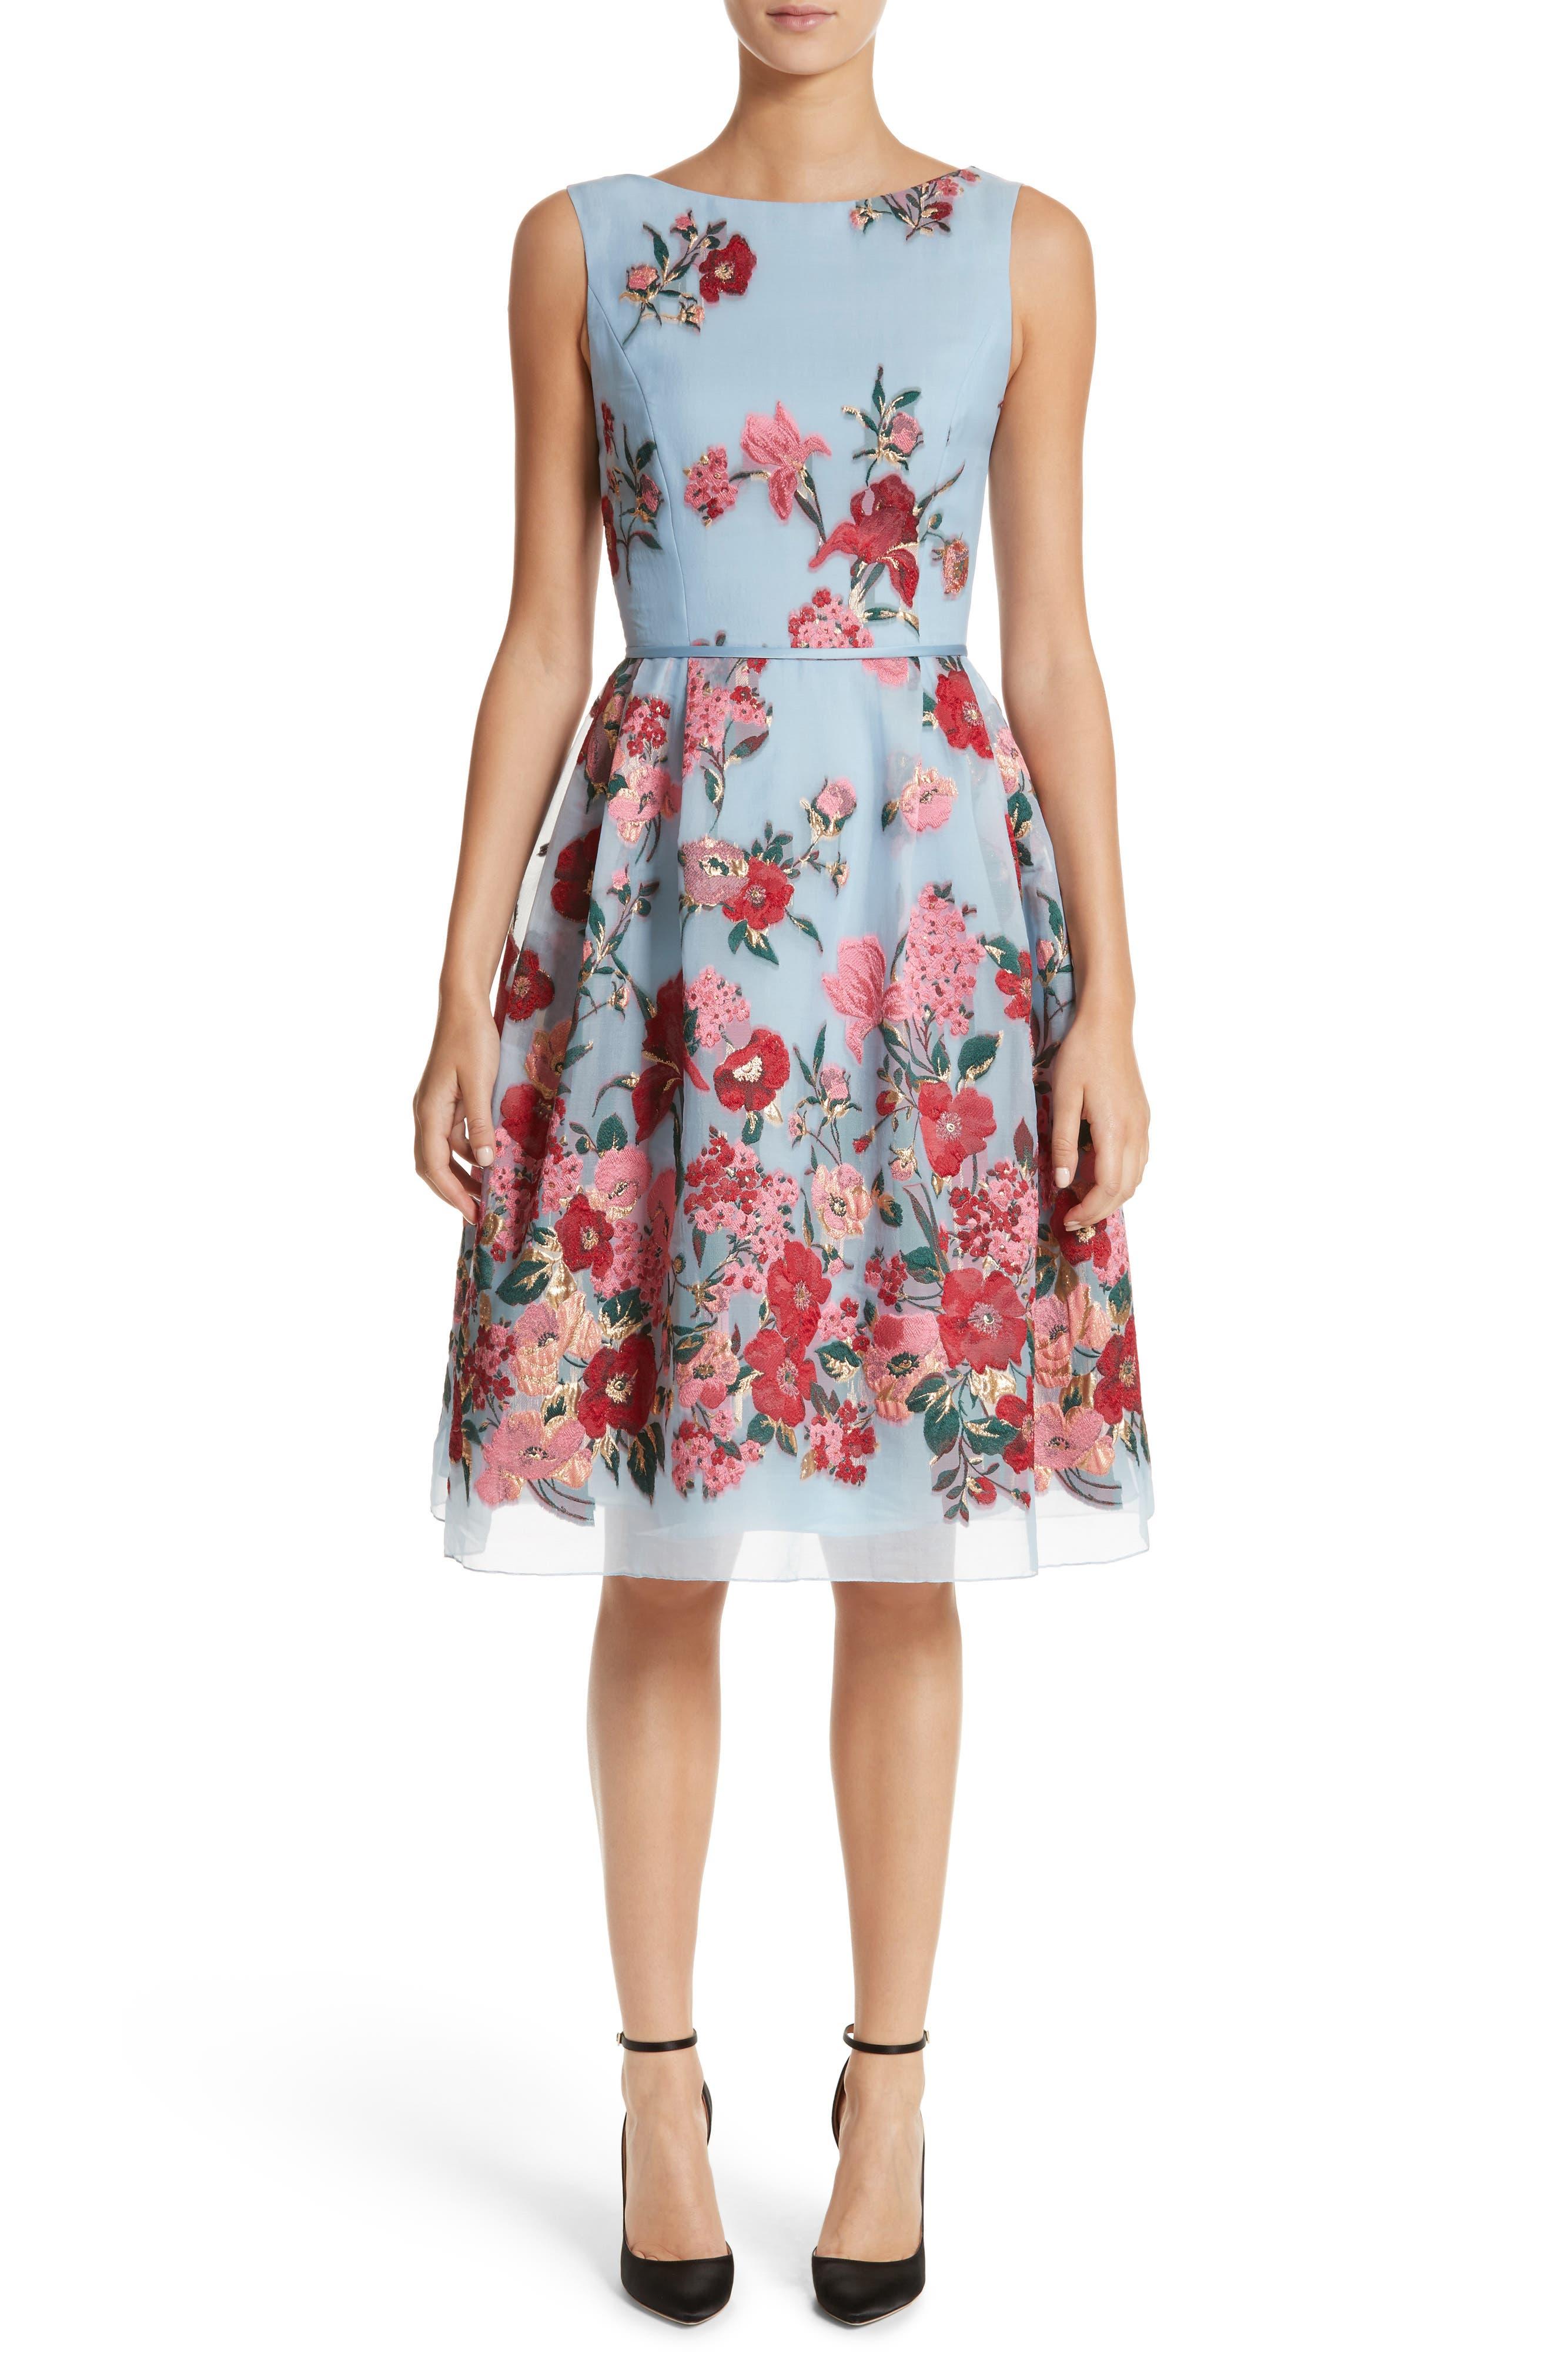 Main Image - Carolina Herrera Embroidered Floral Fit & Flare Dress